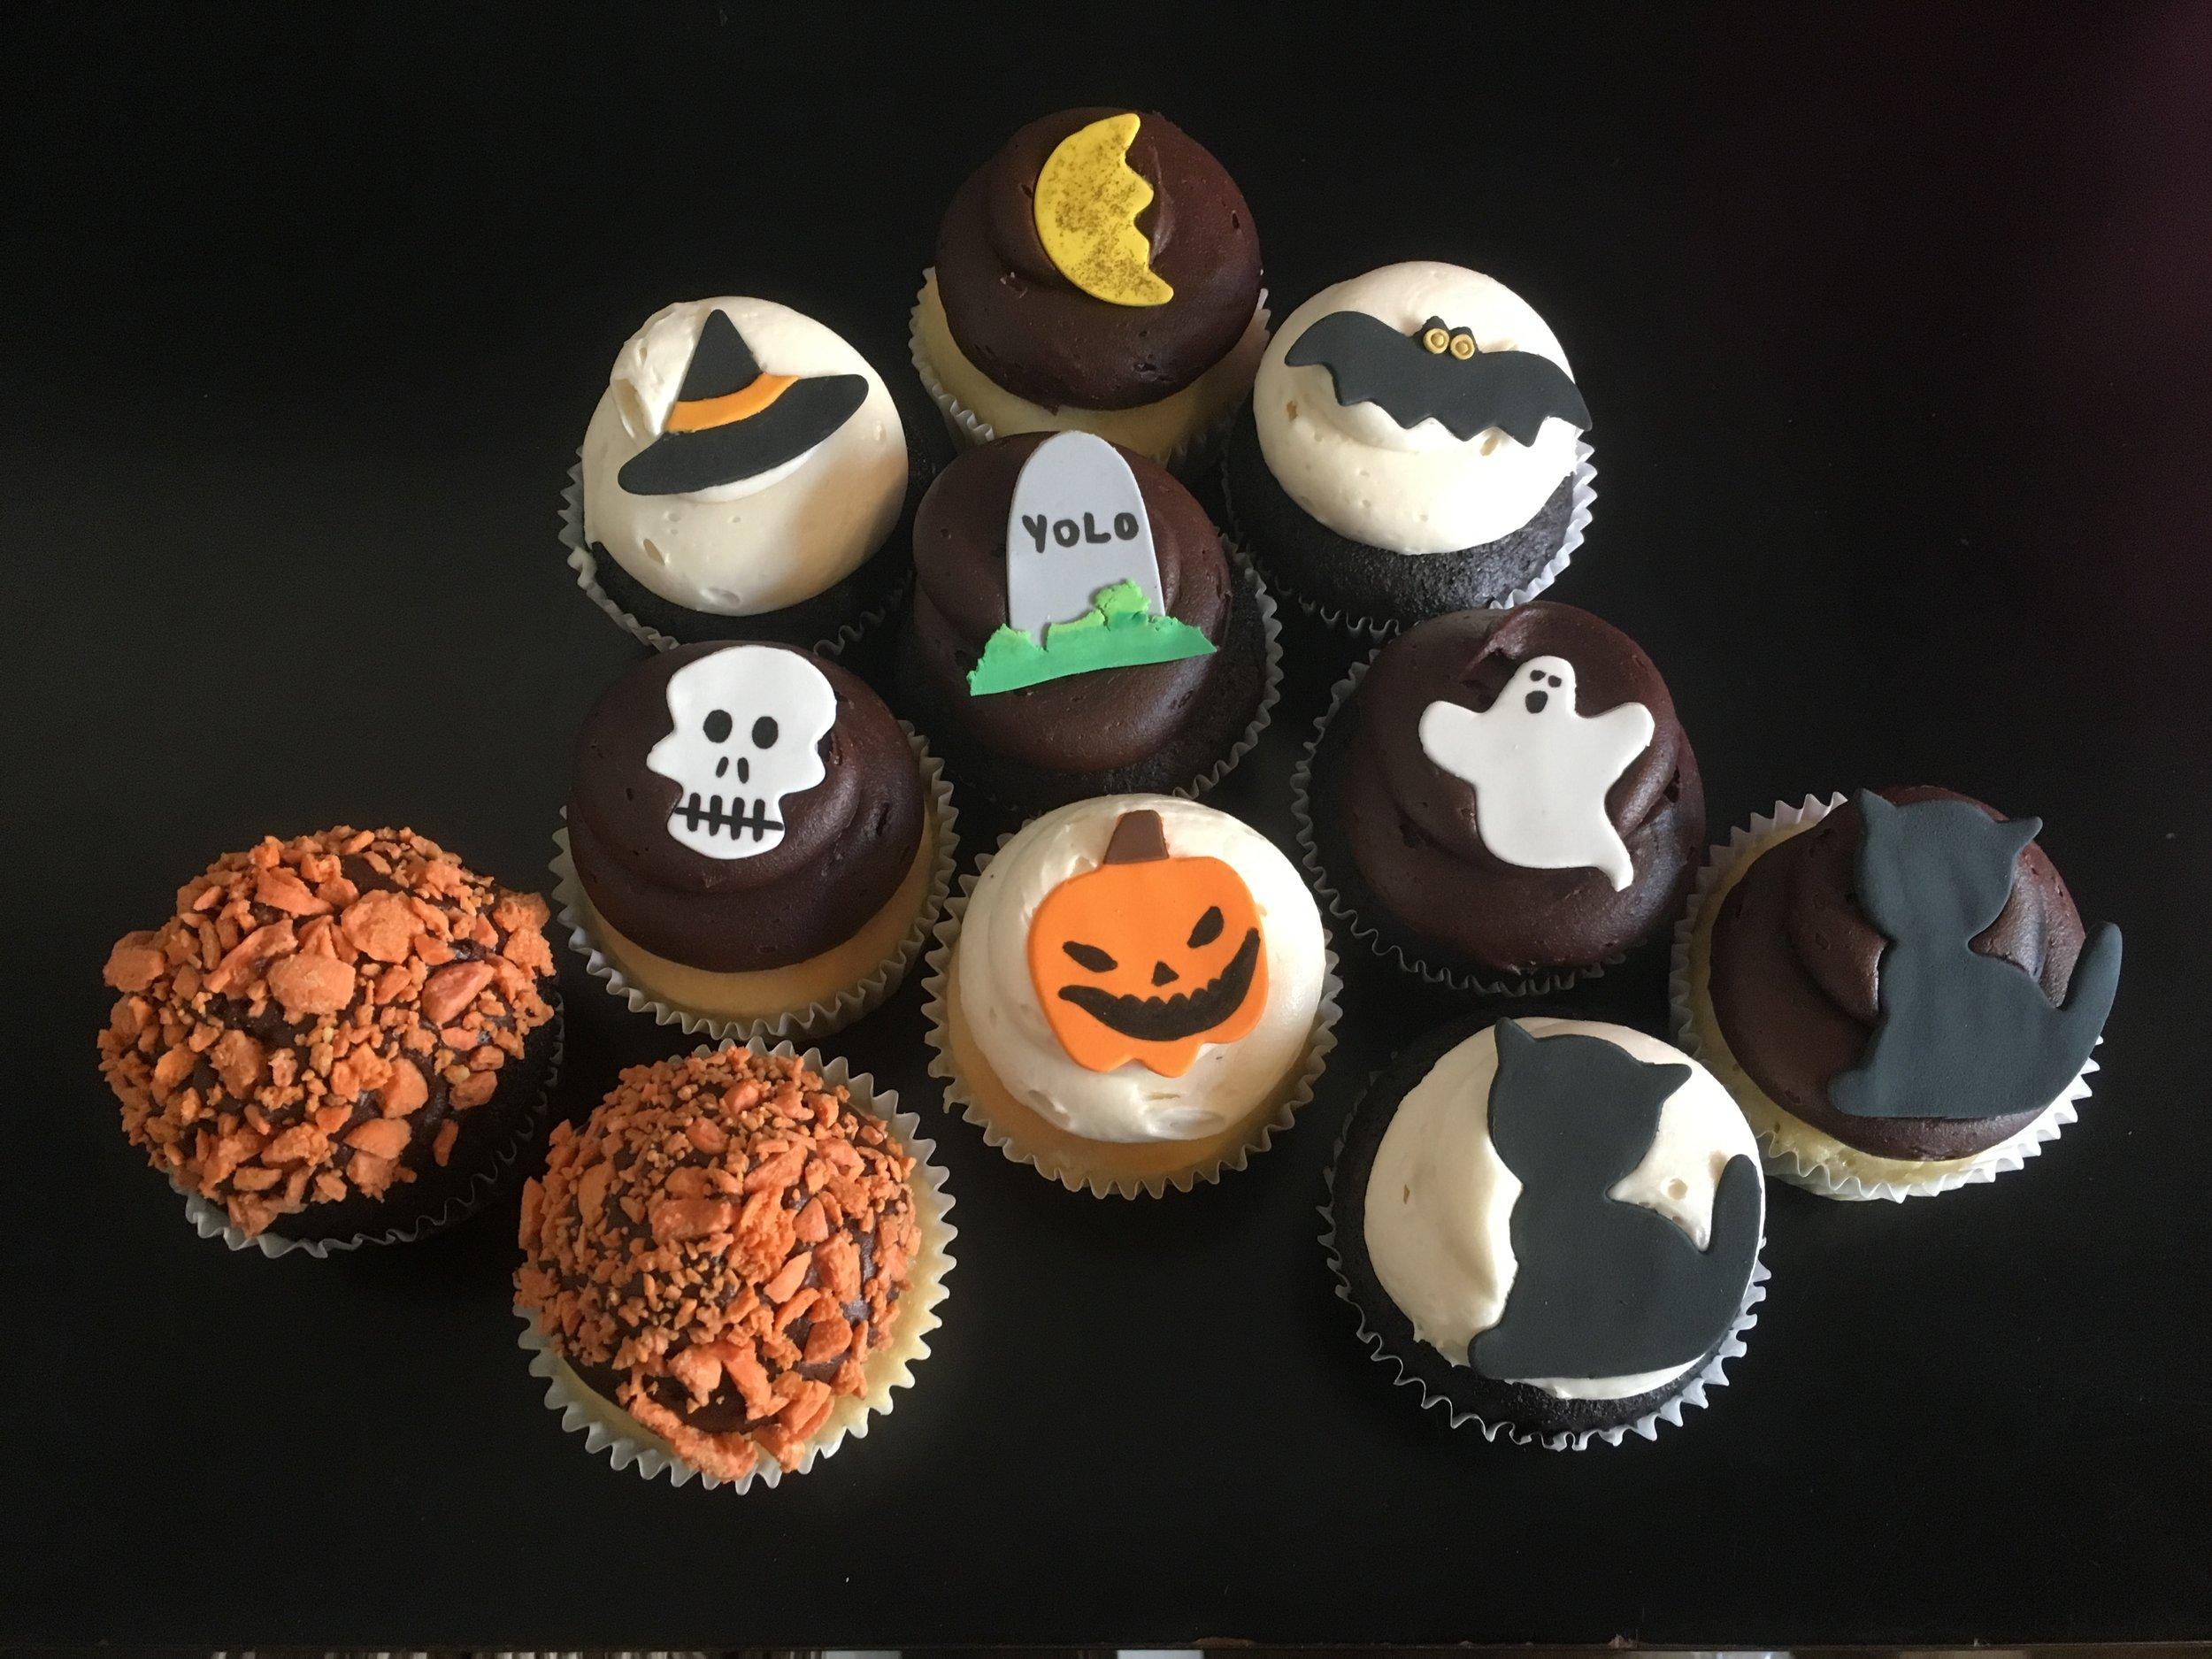 stf-special-octobercupcakes.jpg